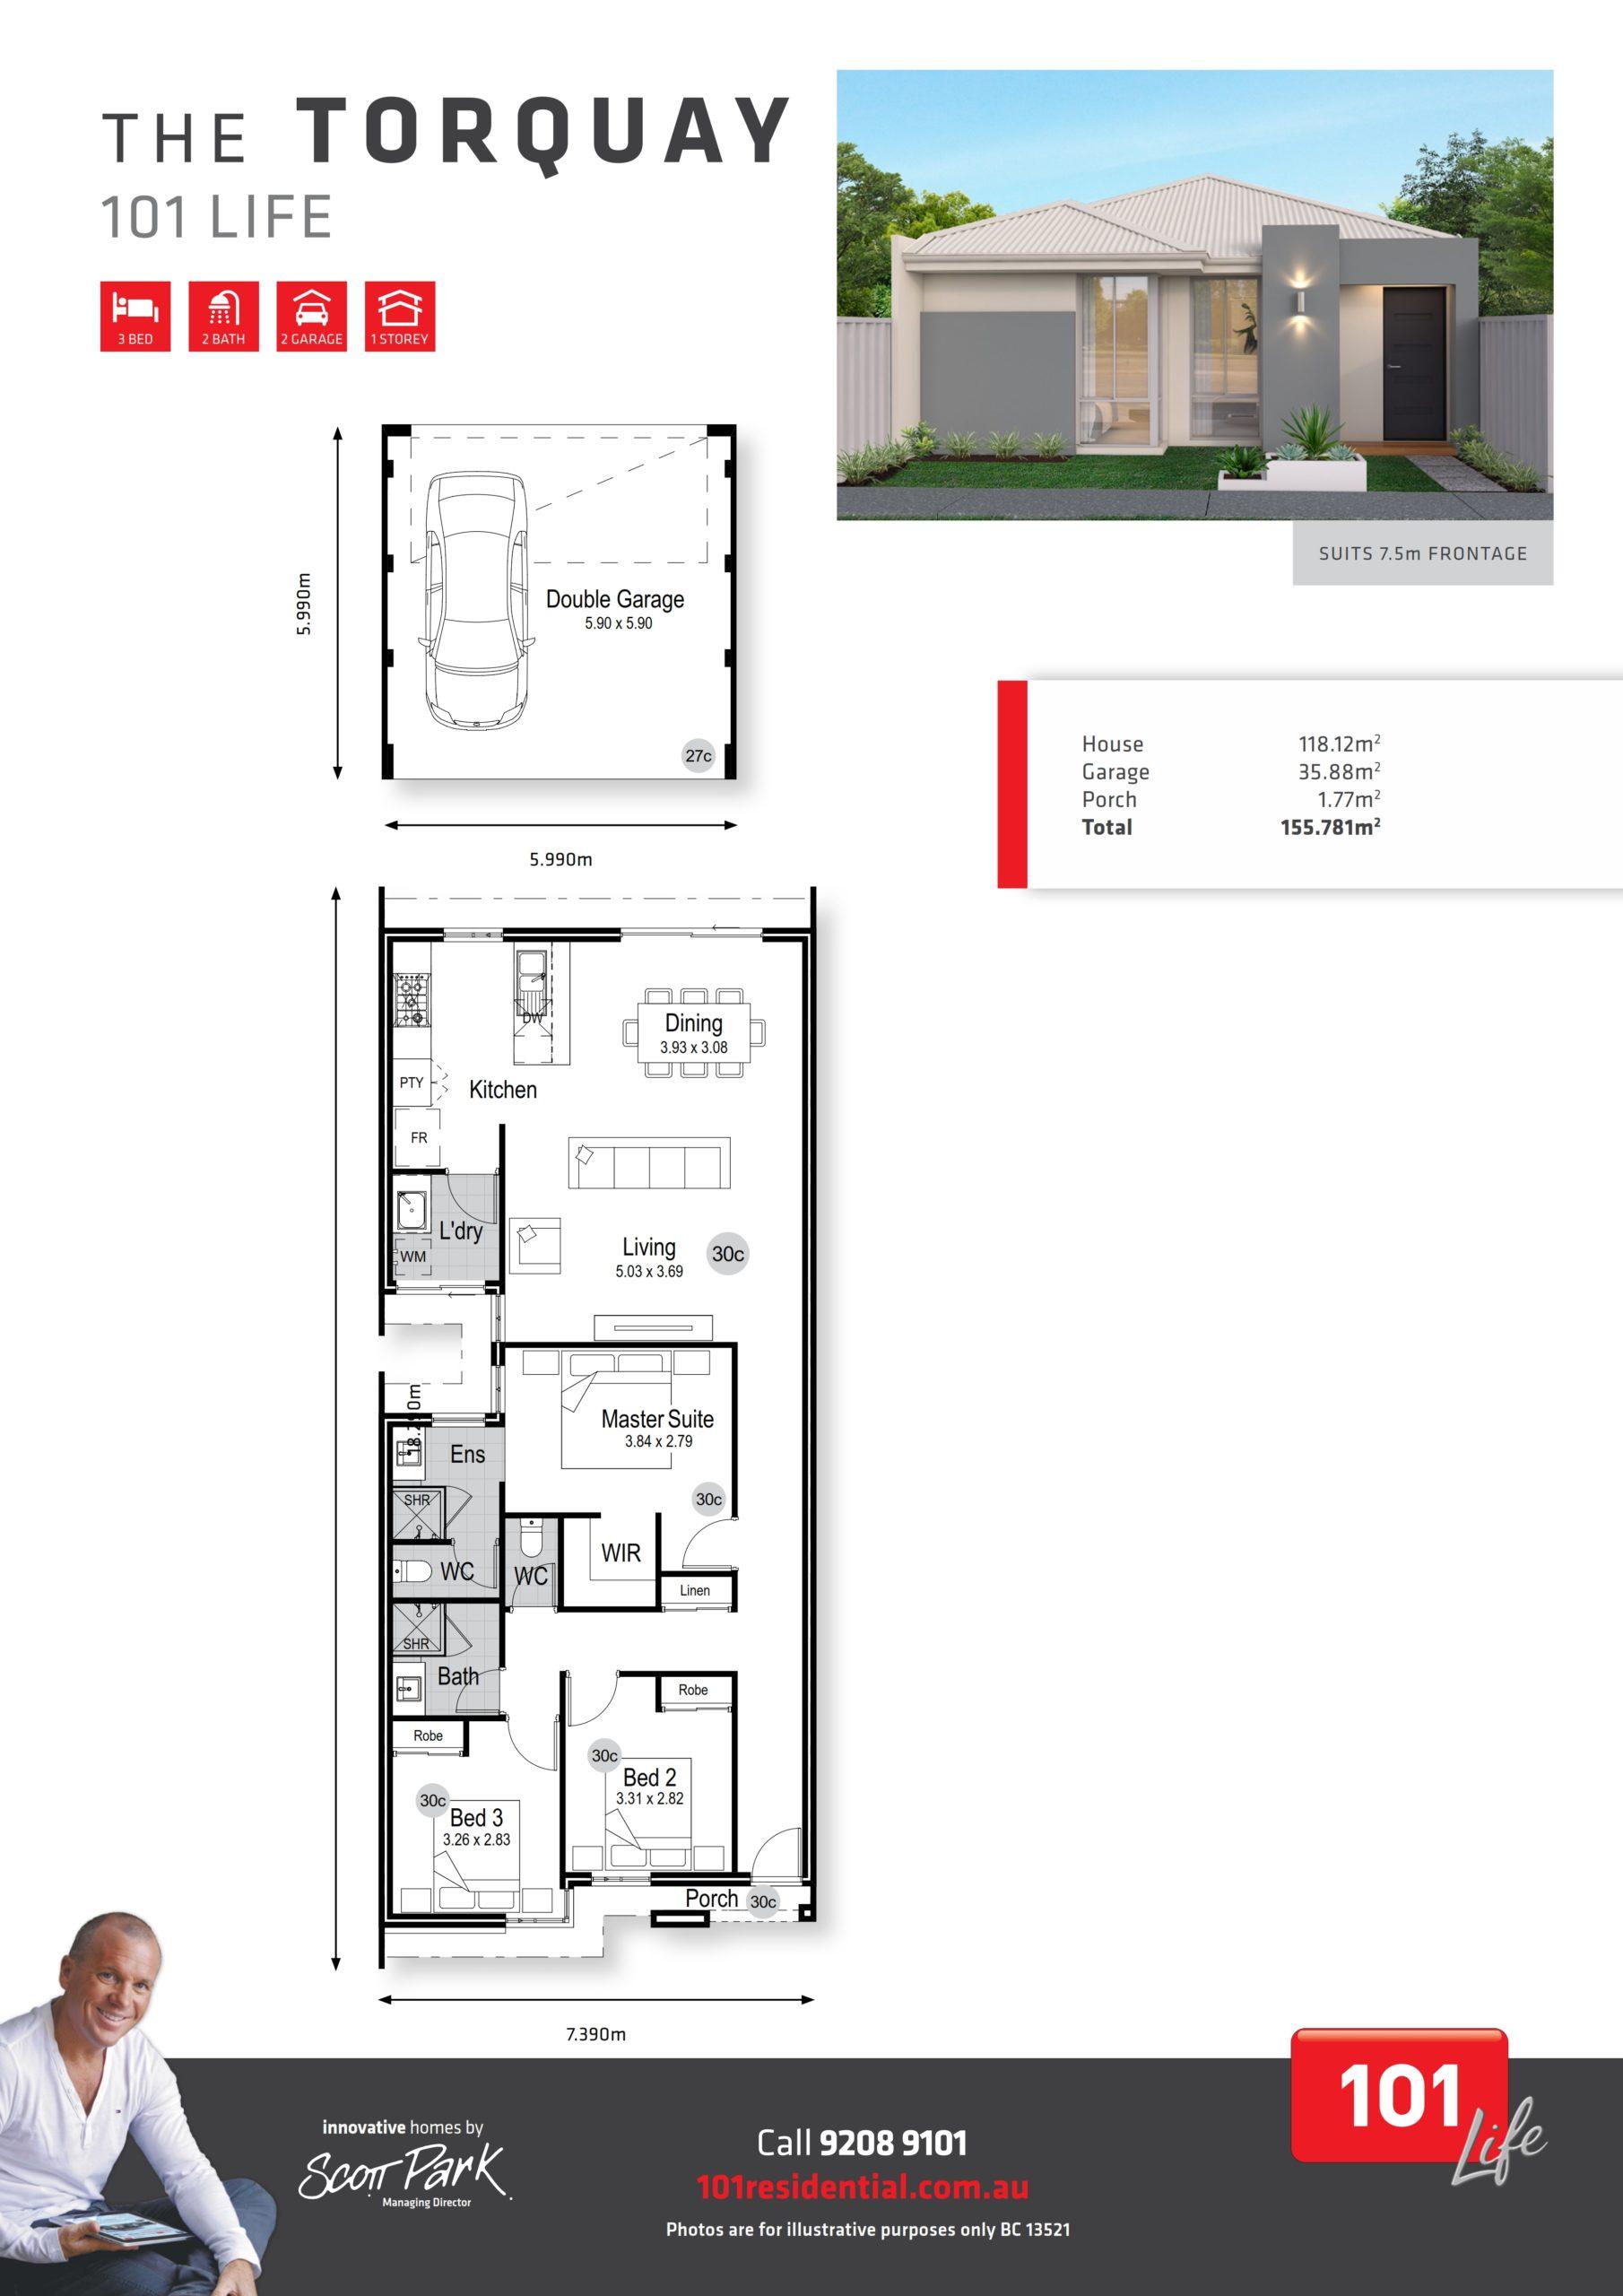 101 Life A3 Floor Plan - Torquay WEB_001